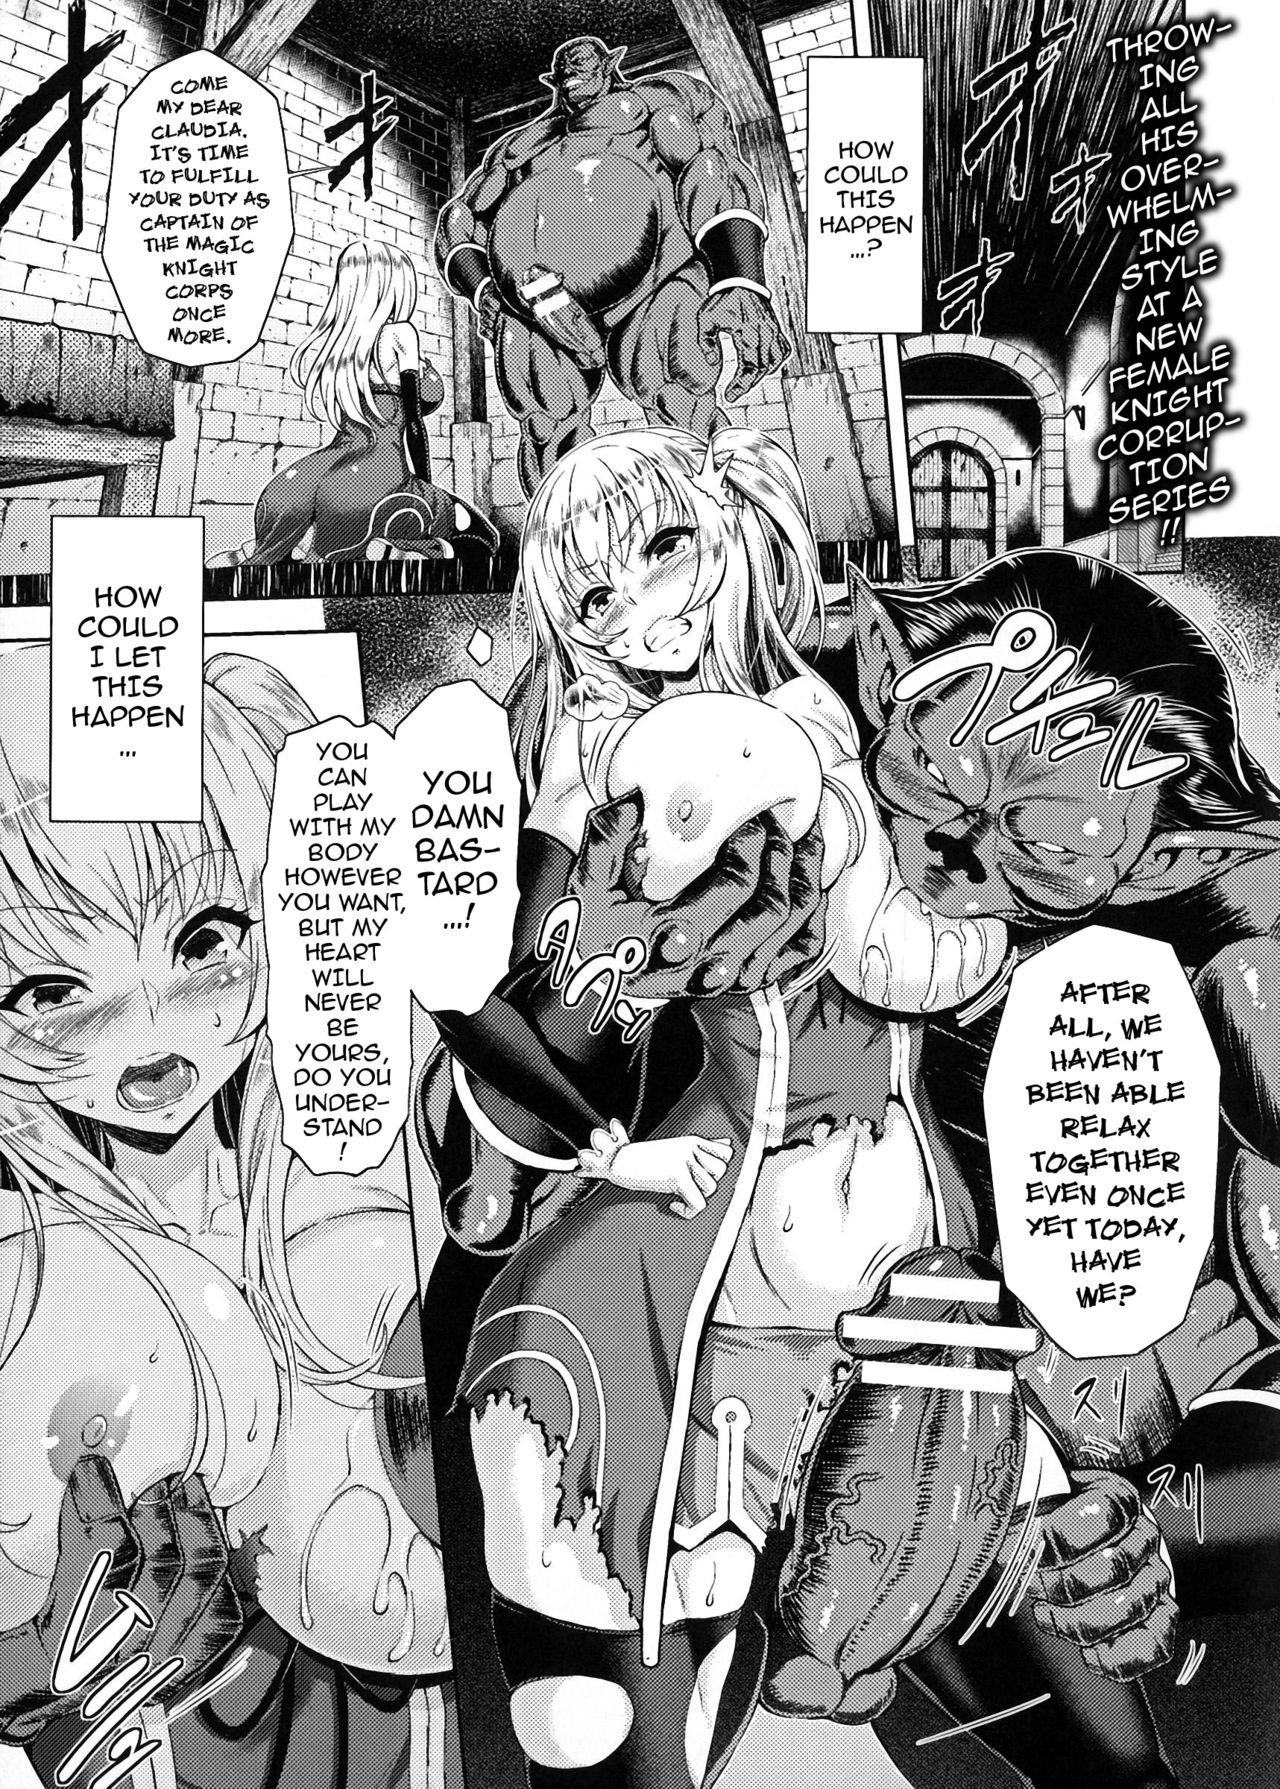 [Yamada Gogogo] Erona ~Orc no Inmon ni Okasareta Onna Kishi no Matsuro~ | Erona ~The Fall of a Beautiful Knight Cursed with the Lewd Mark of an Orc~ [English] {darknight} 1